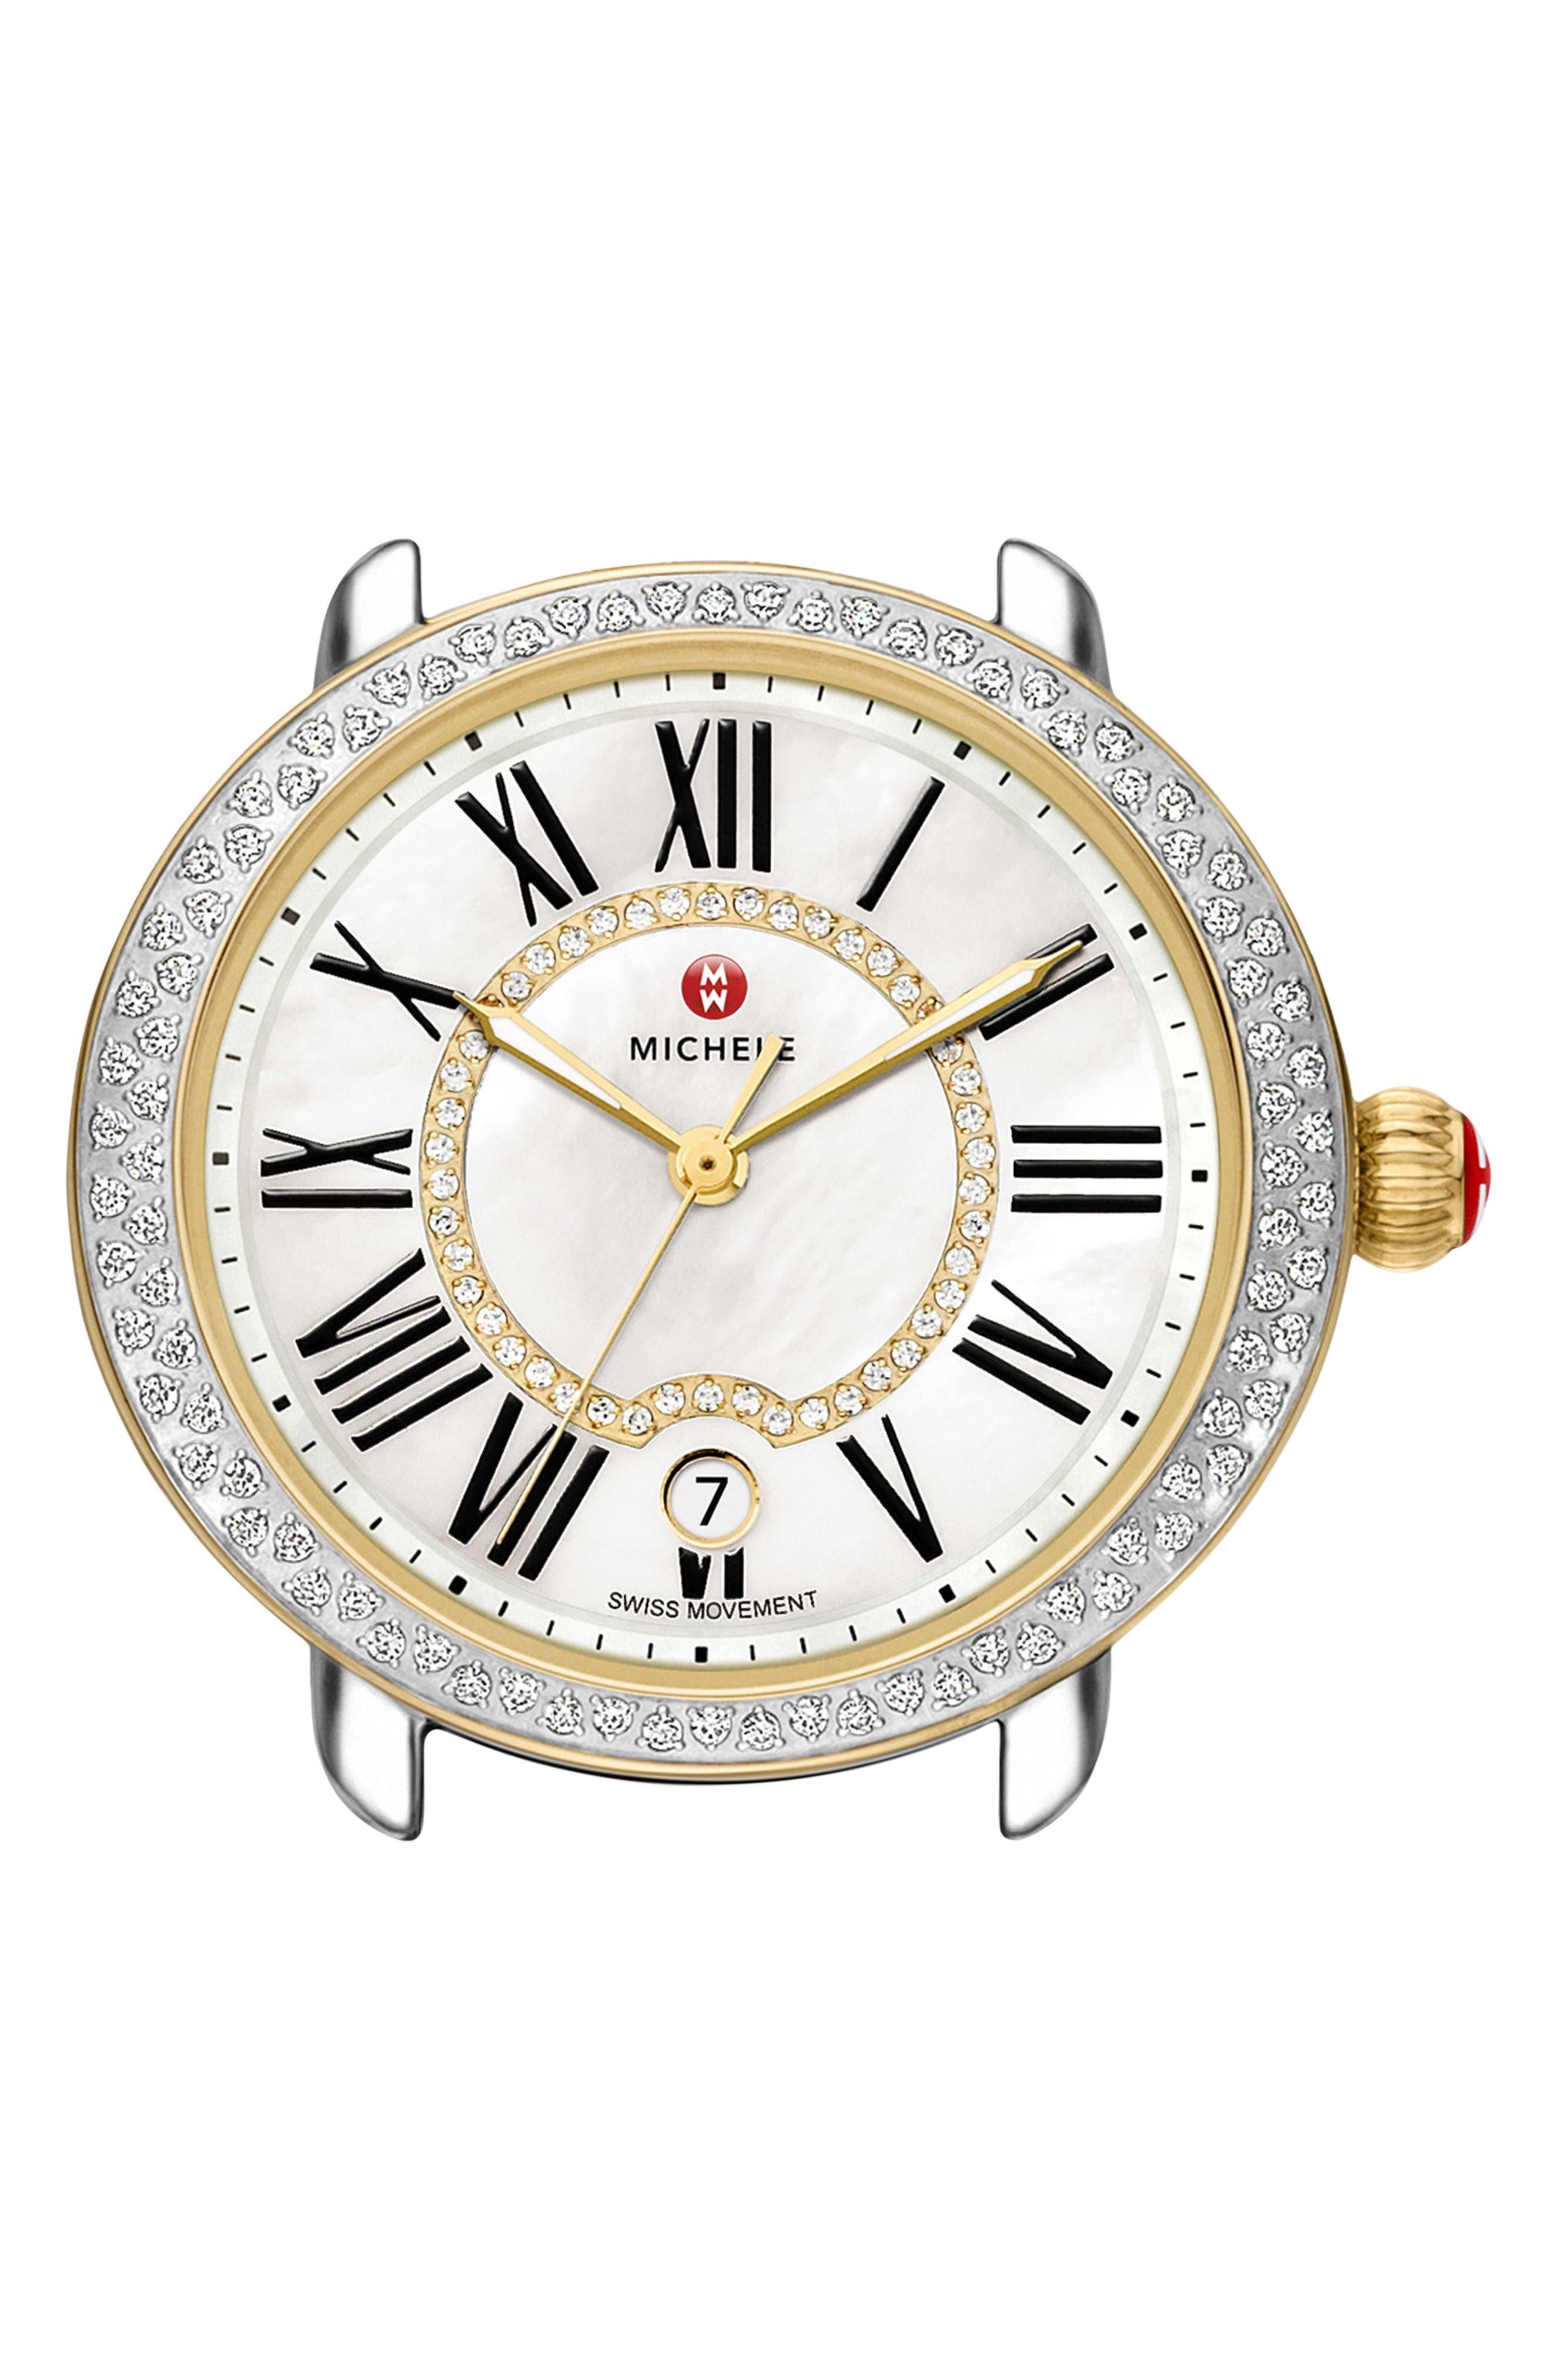 Serein 16 Diamond Watch Case, 34mm x 36mm,                         Main,                         color, GOLD/ SILVER